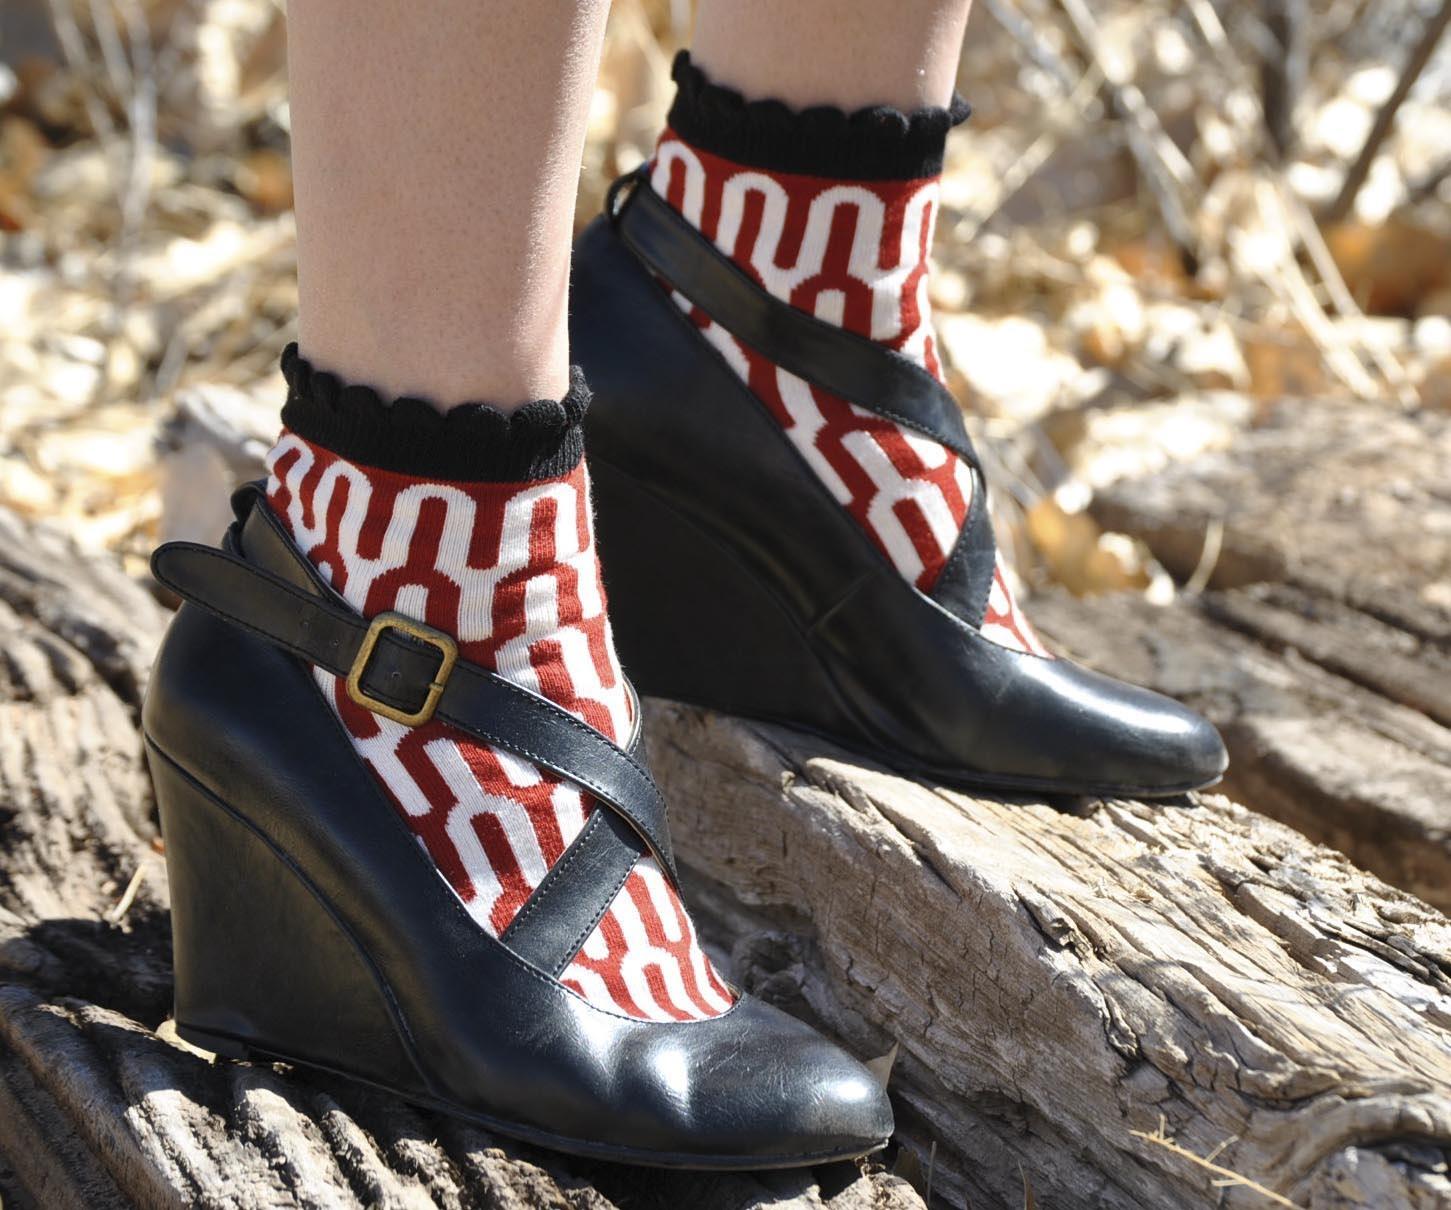 Hippe sokken Amelia Red Anklet Sweet Marcel